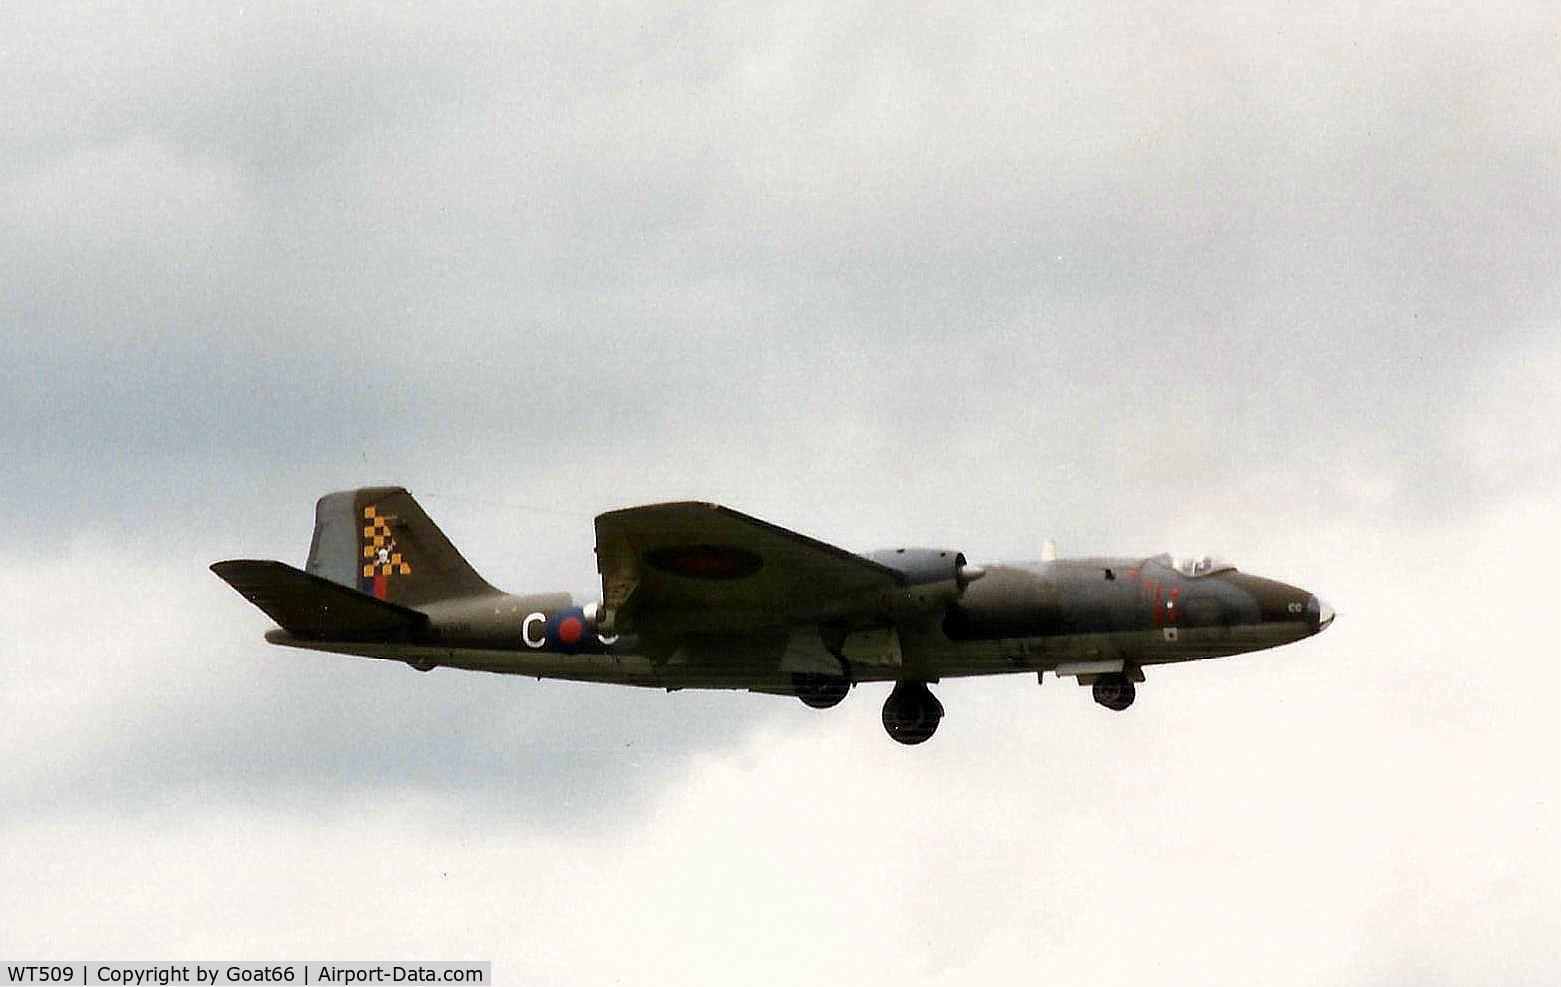 WT509, 1955 English Electric Canberra PR.7 C/N EEP71369, Caught flying........RAF Wyton June 1988